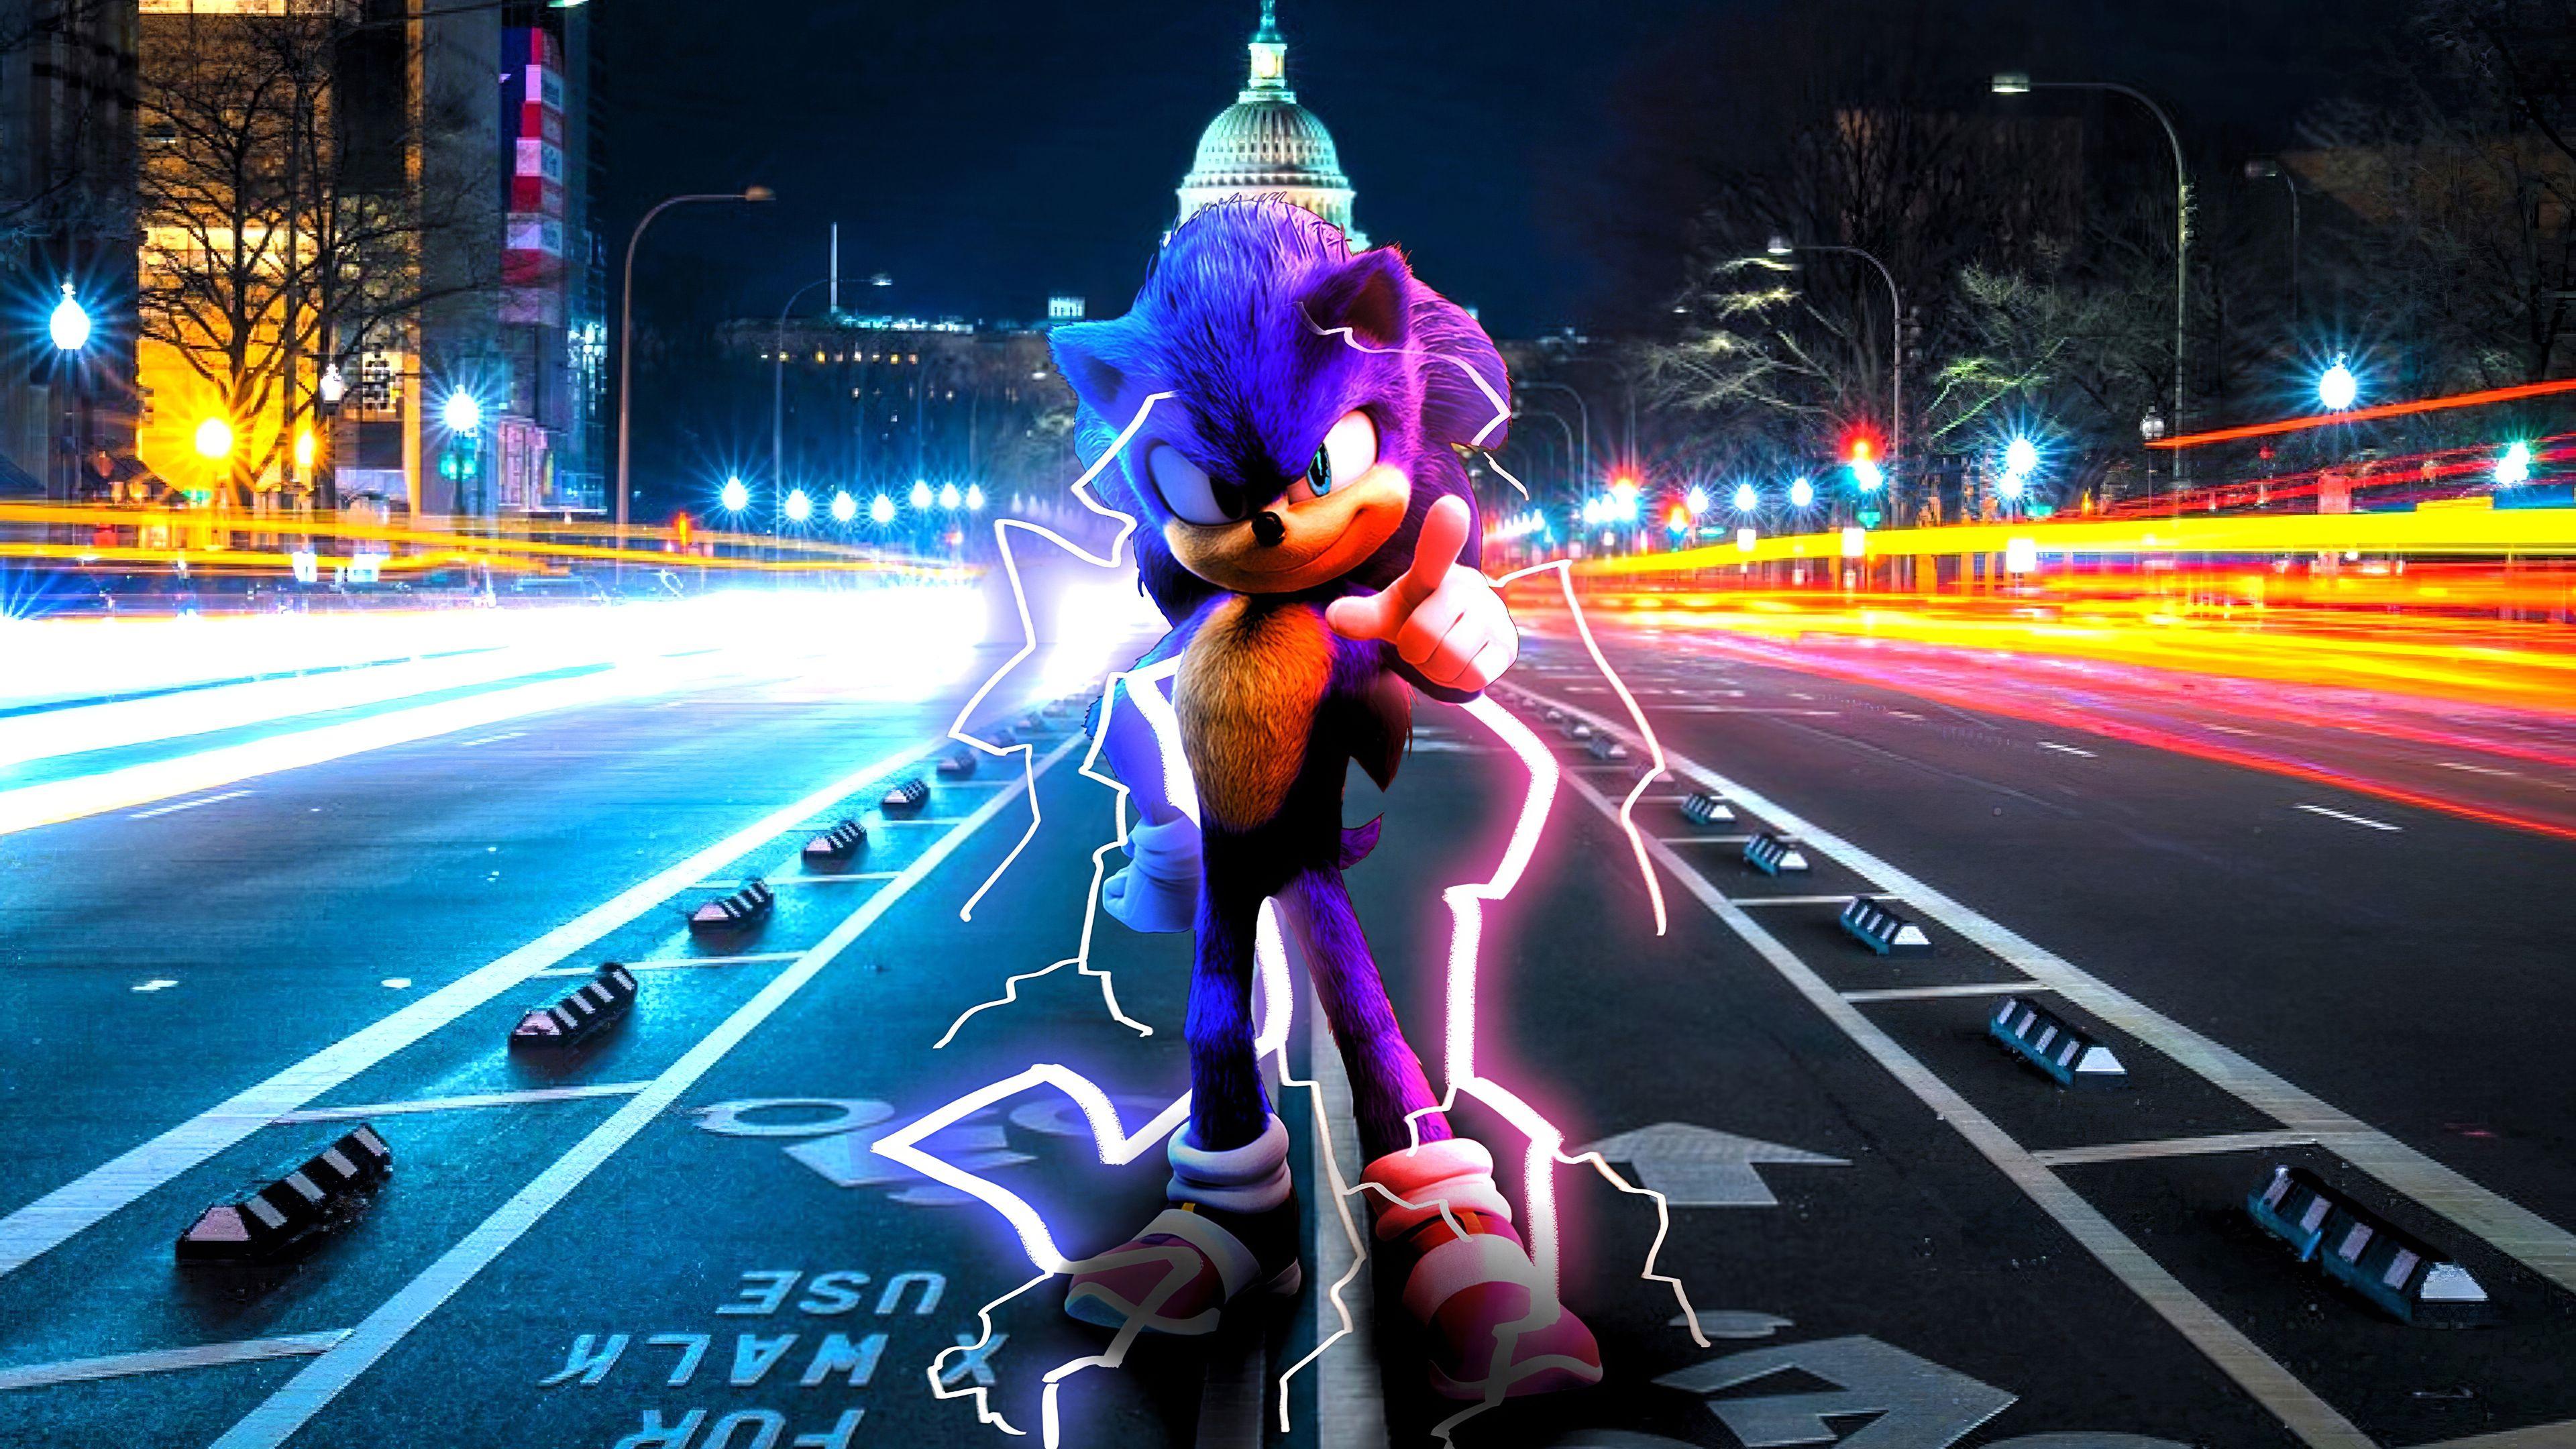 2020 Sonic The Hedgehog 2020 Sonic The Hedgehog Wallpapers 2020 Sonic The Hedgehog 4k Wallpapers Sonic Wallpaper Pc Sonic The Hedgehog